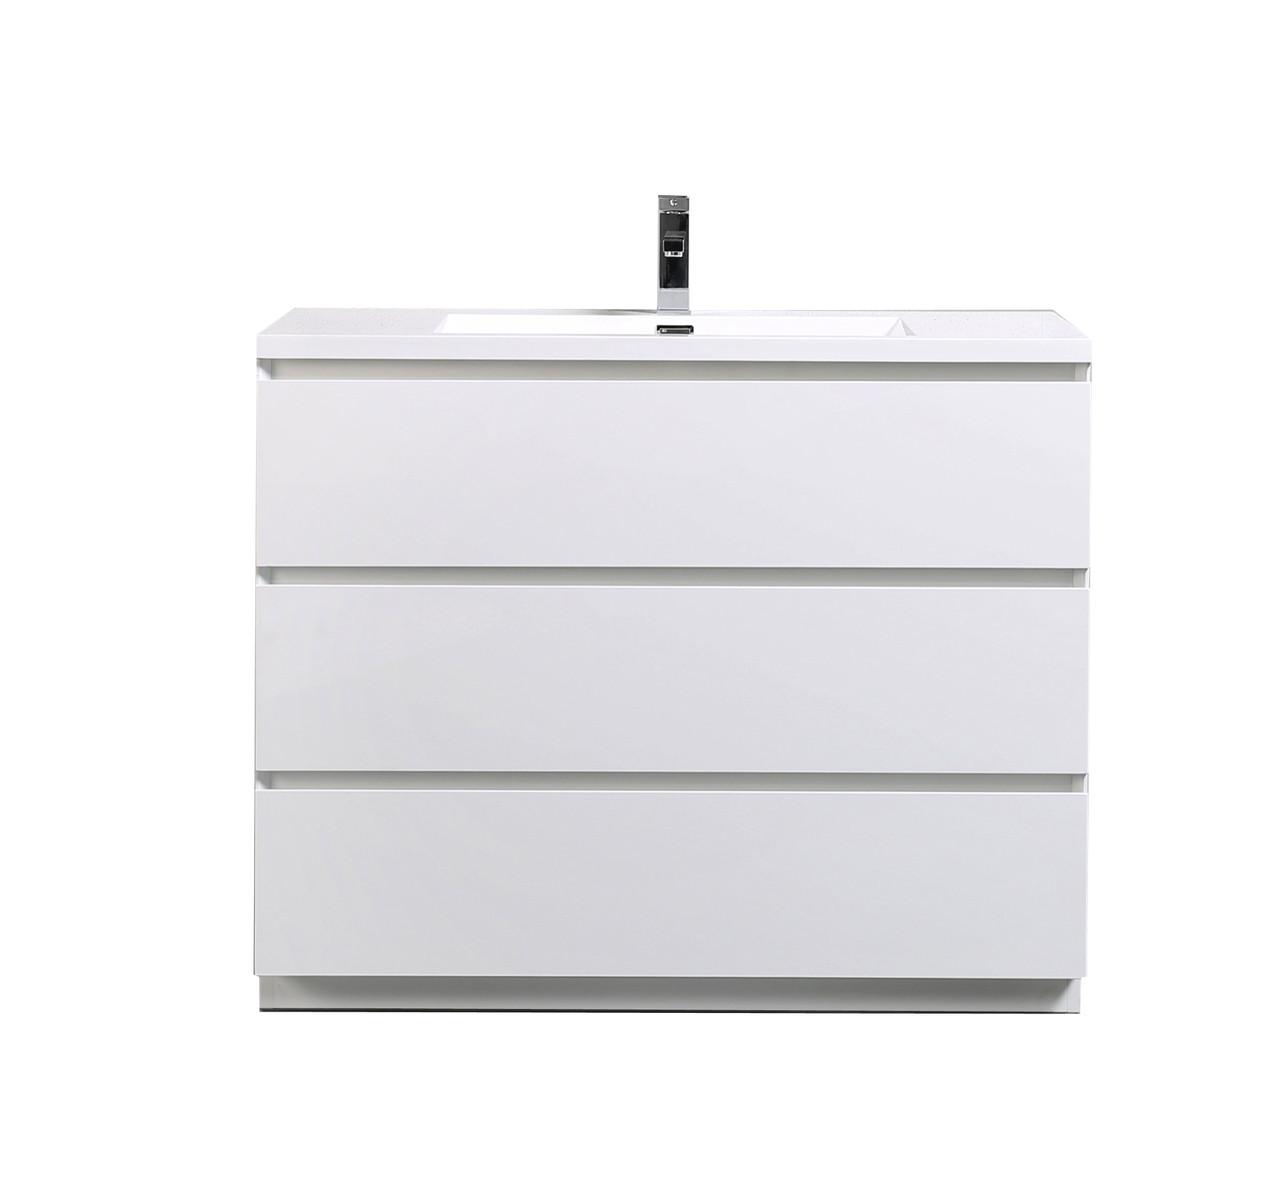 Moa 42 Gloss White Modern Bathroom Vanity W 3 Drawers And Acrylic Sink Los Angeles Vanity